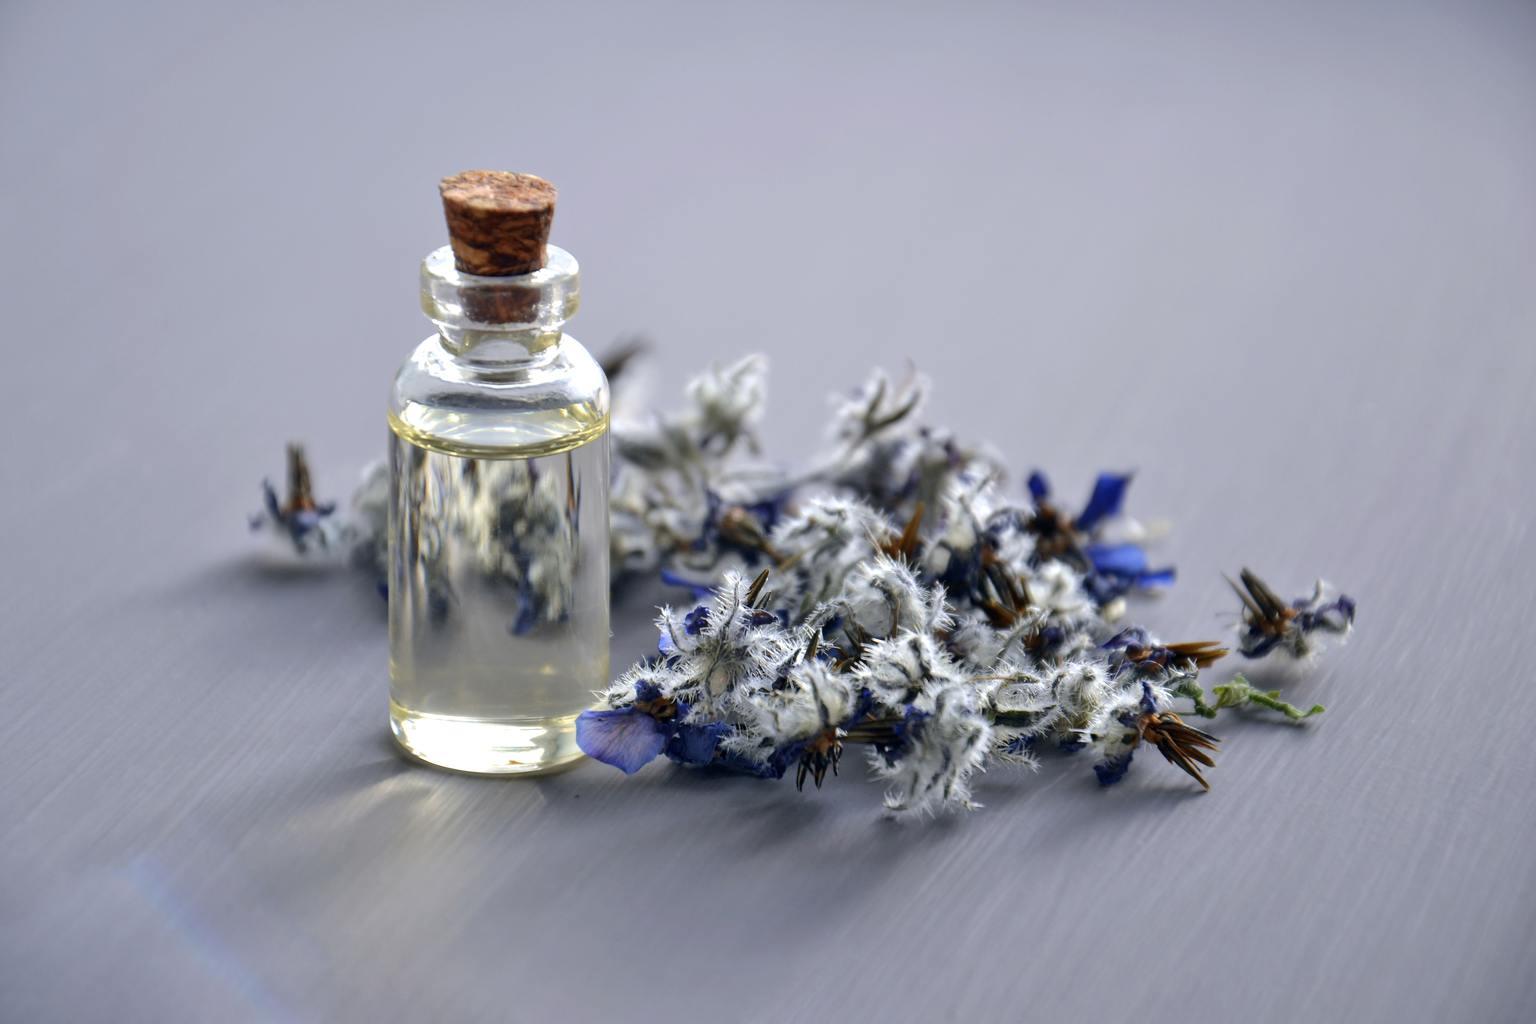 essential oil fragrance for your partner